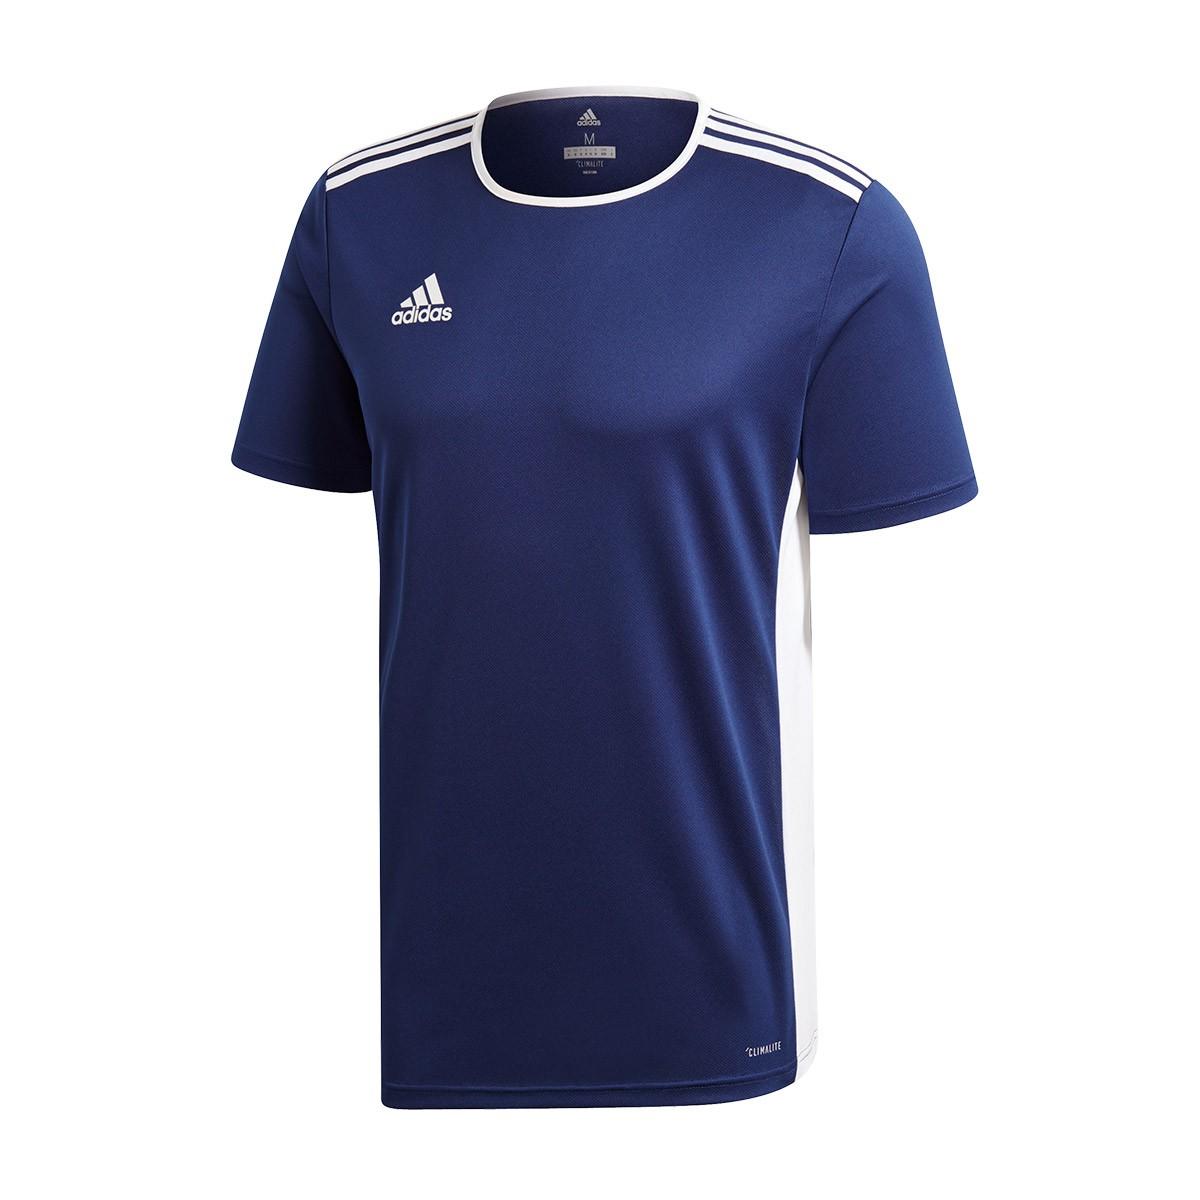 Jersey adidas Entrada 18 m/c Dark blue-White - Fútbol Emotion